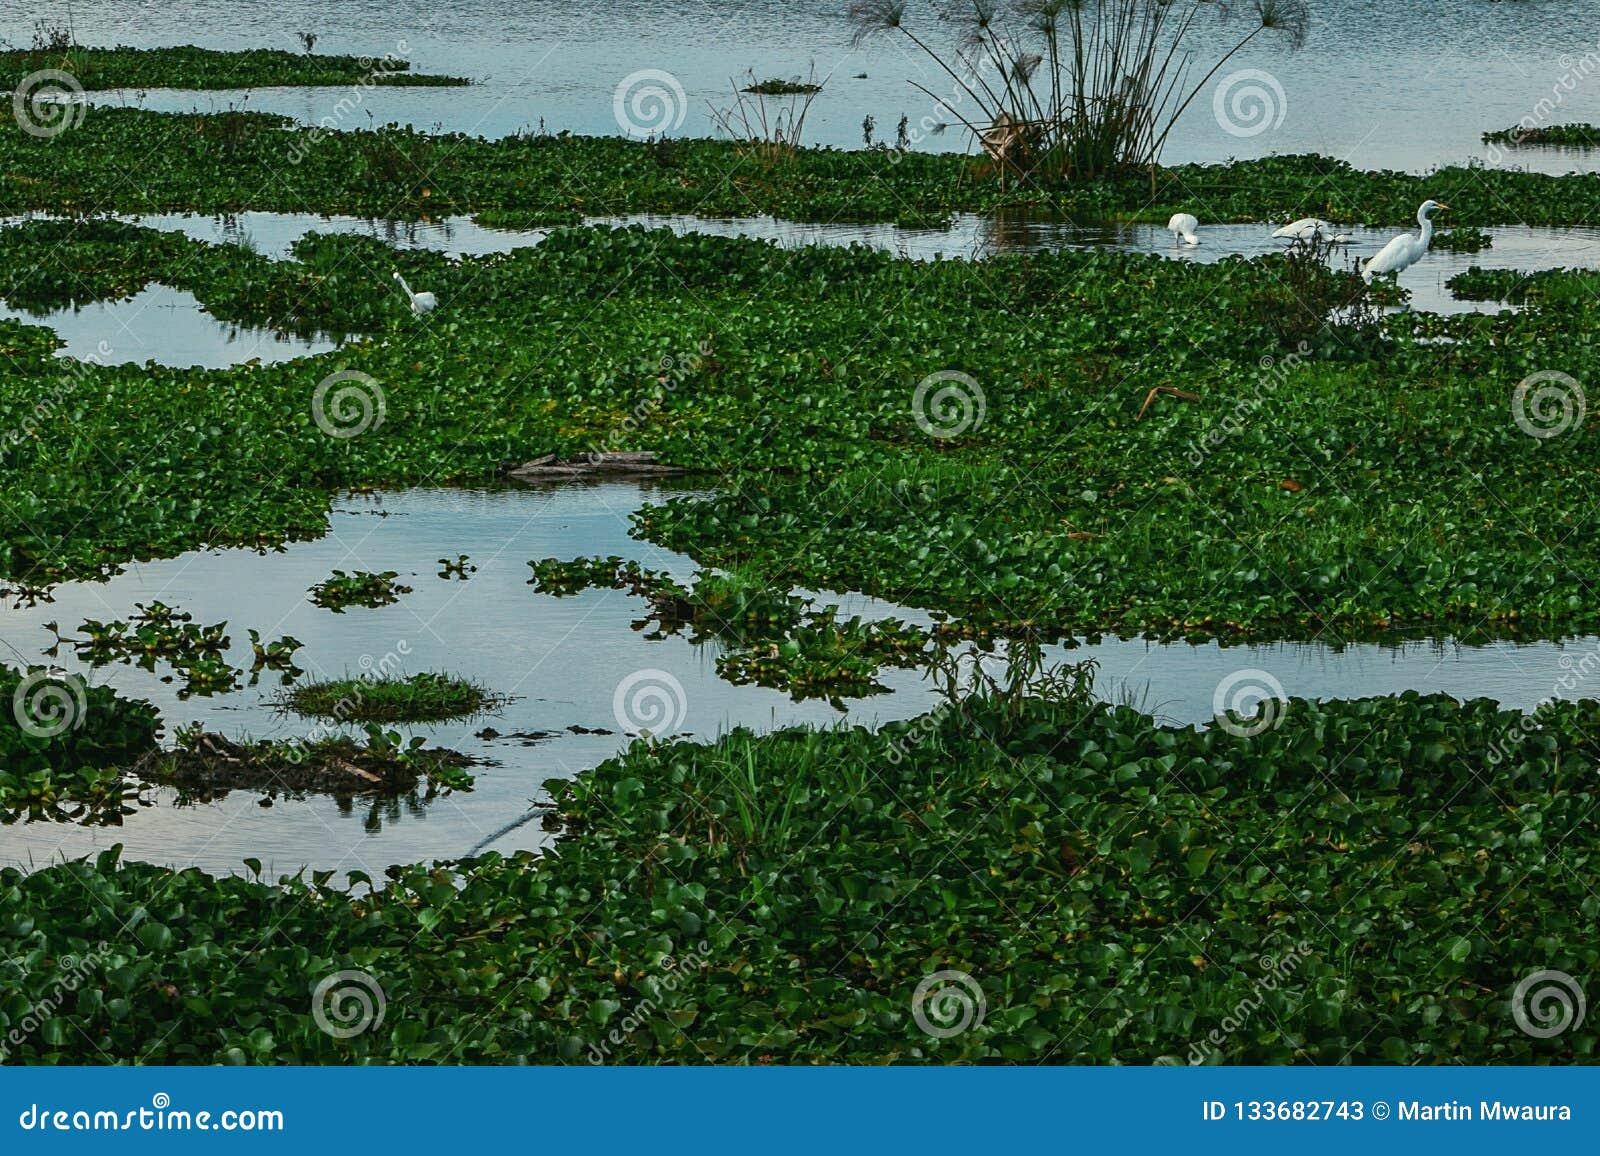 Pelicans in the water hyacinth in Lake Naivasha